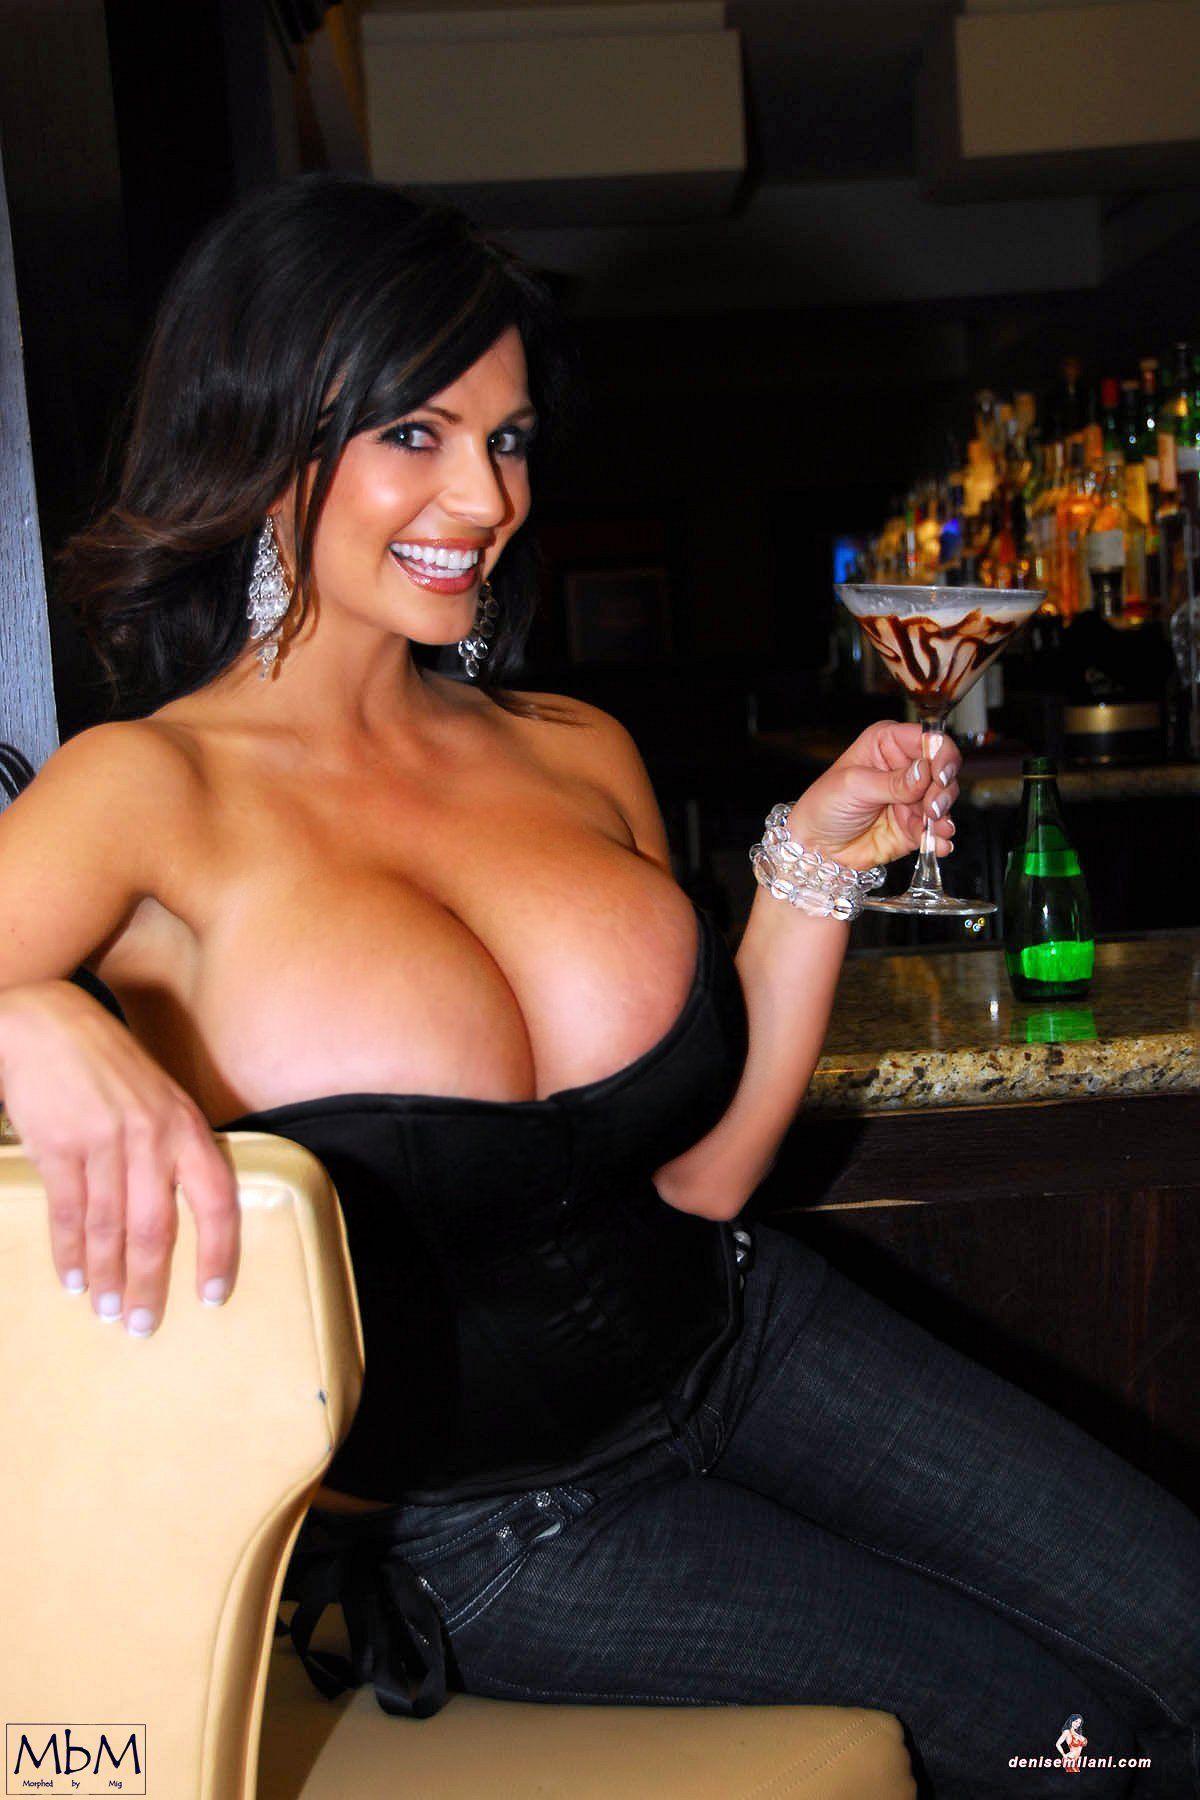 9 best denise milani images on pinterest | milani, beautiful women